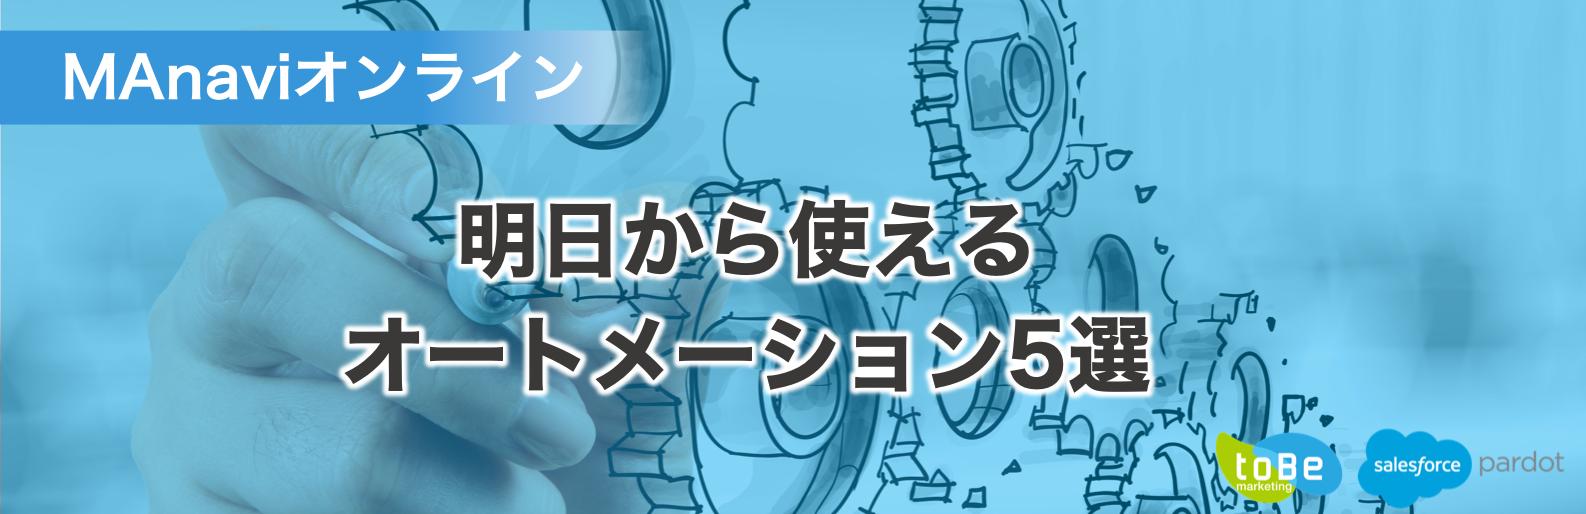 【MAnaviオンライン】明日から使えるオートメーション5選